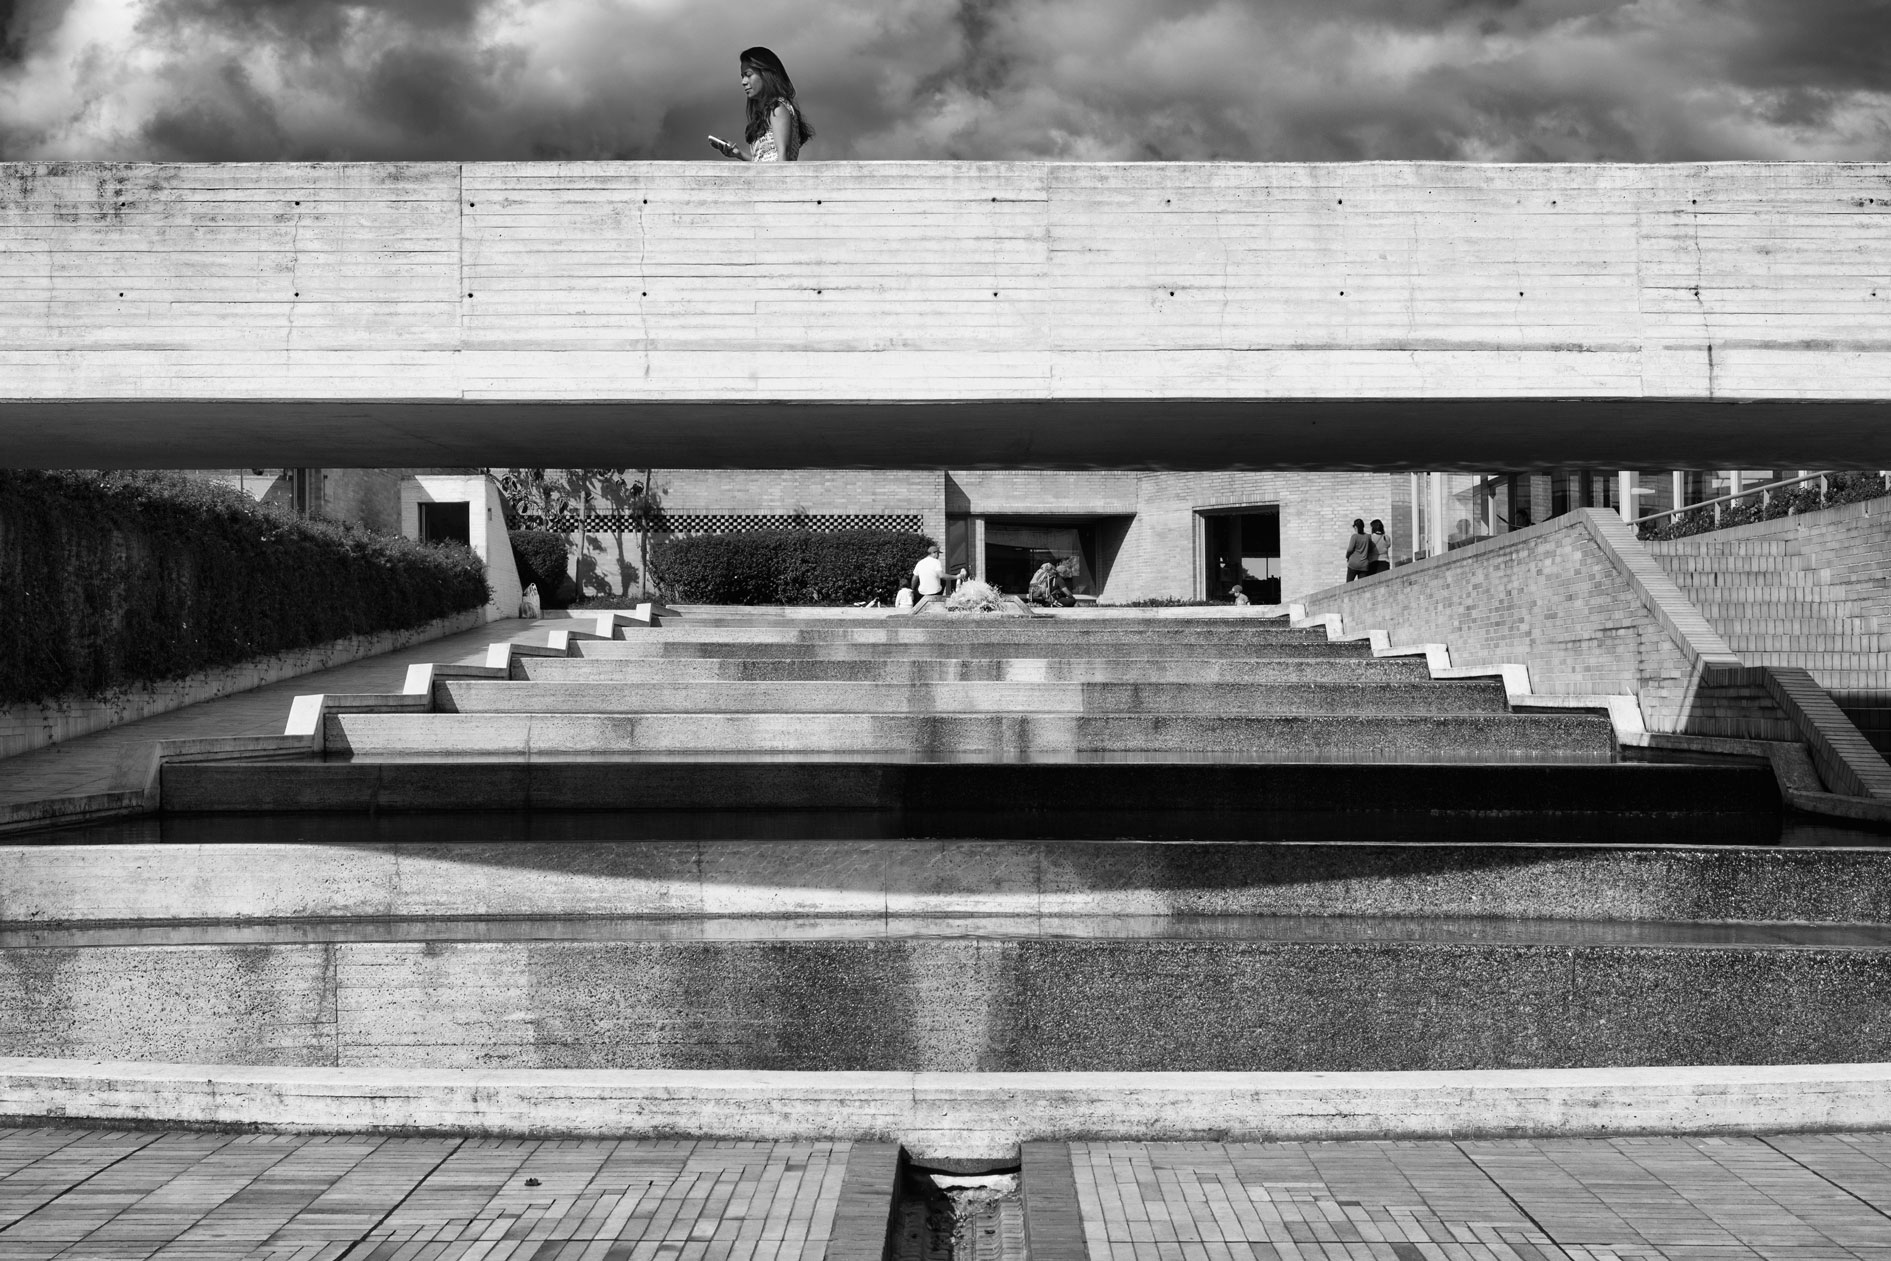 06-simonbosch photography-simon-bosch-architectuur-architecture-bogota-colombia-ArchDaily-Biblioteca Publica Virgilio Barco